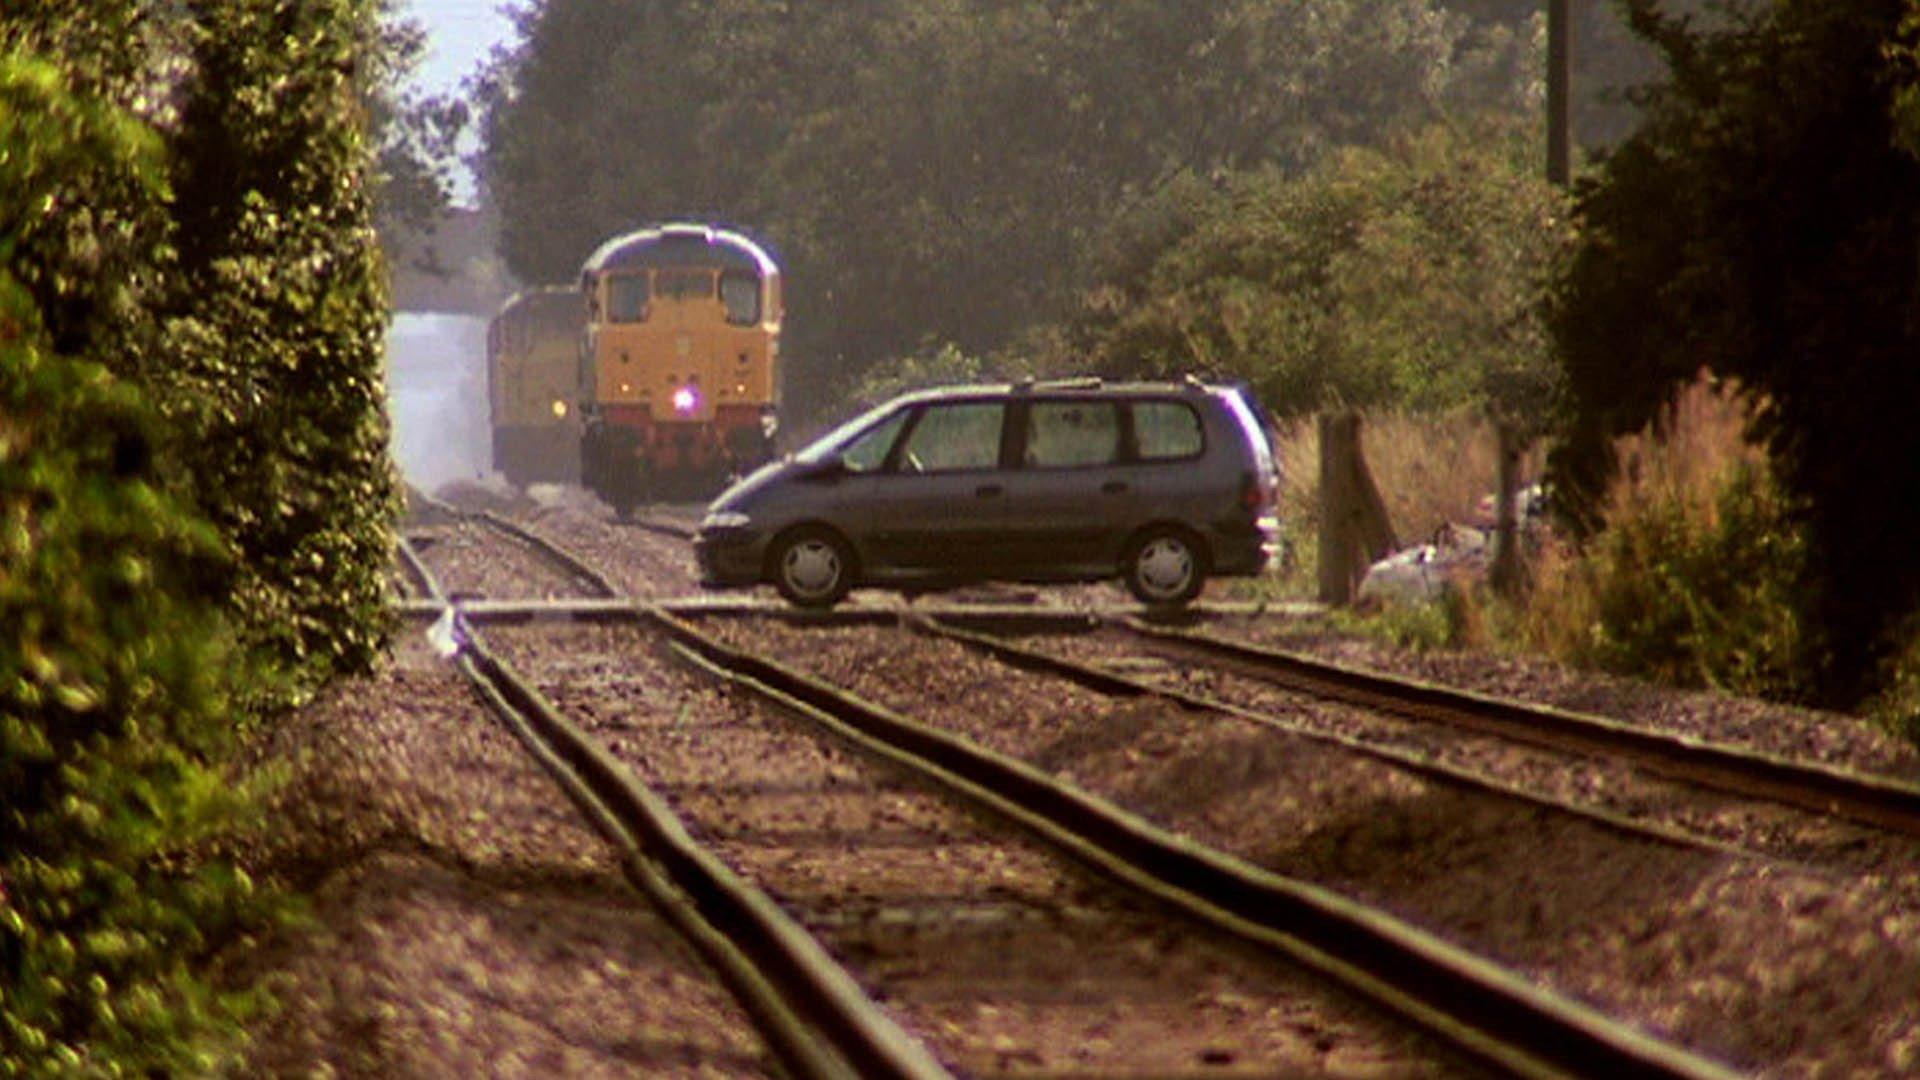 top gear 9 episode 3 clarkson crashes a train into a renault espace motortrend top gear 9 episode 3 clarkson